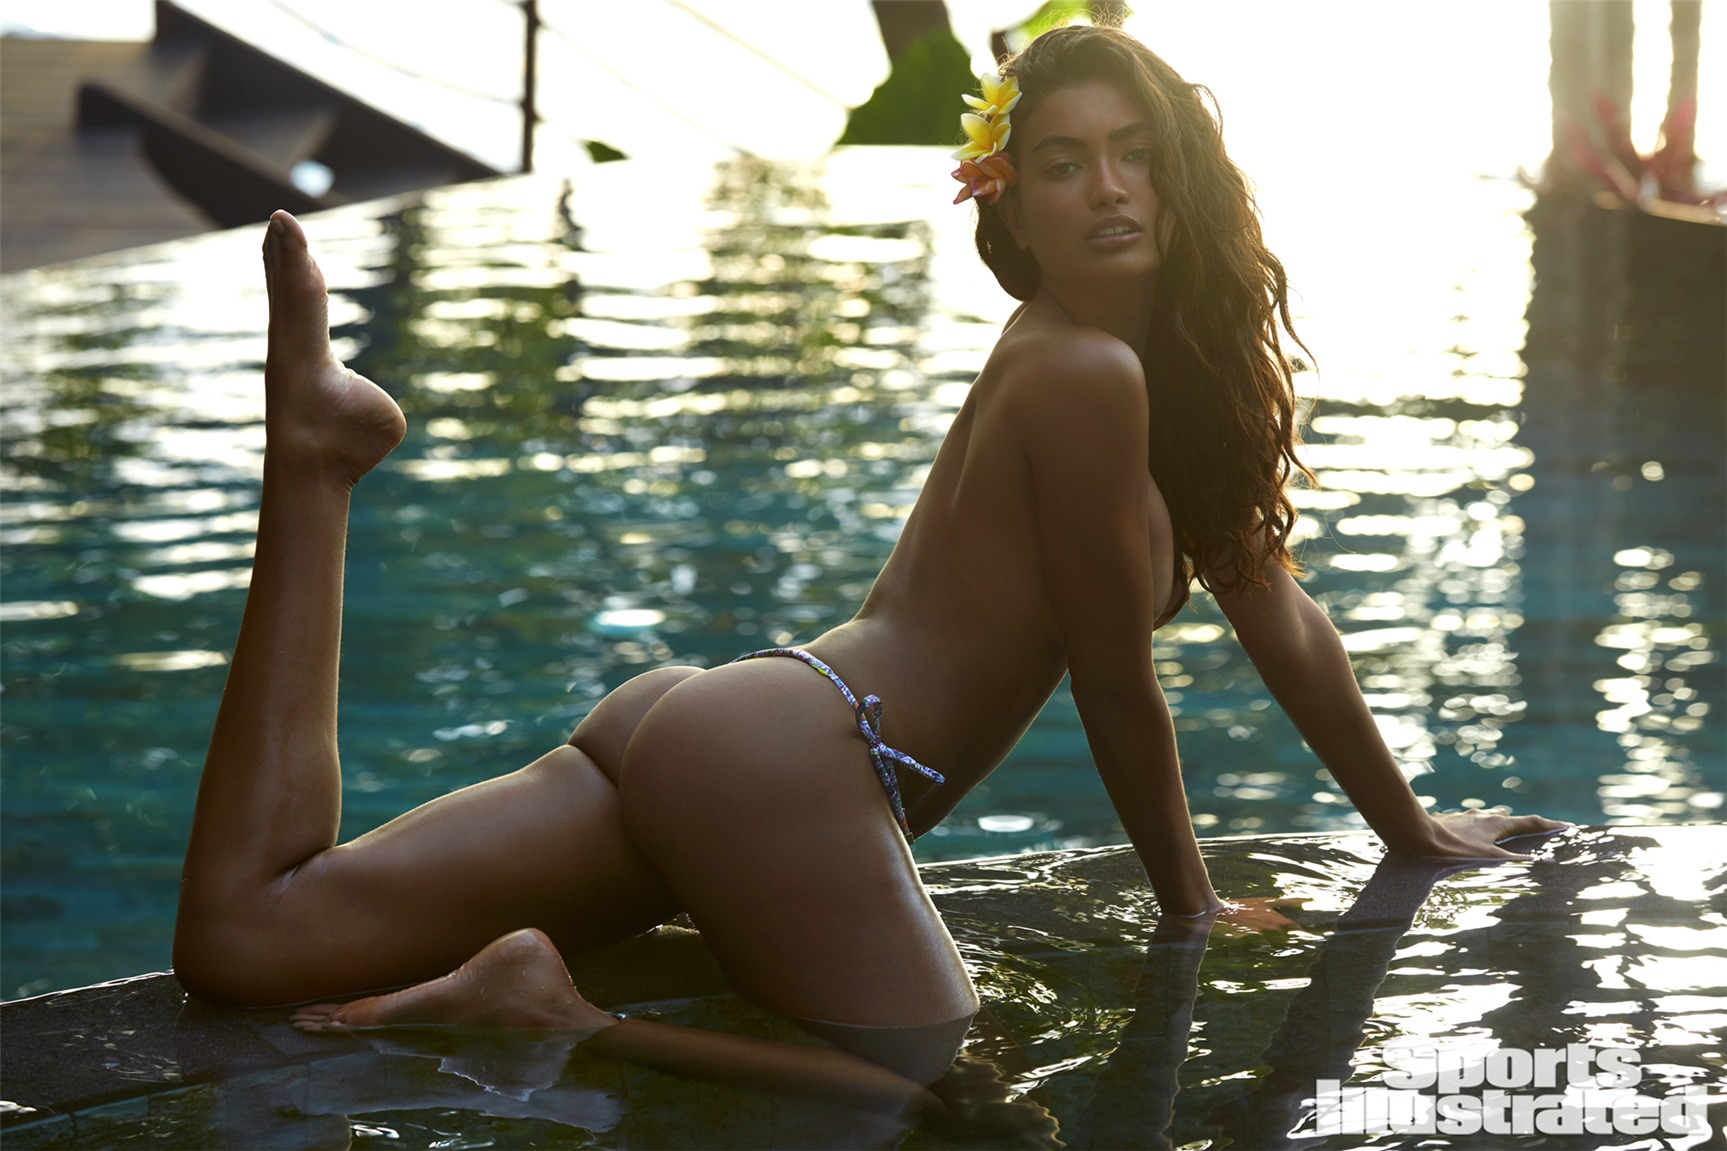 Kelly Gale / Келли Гейл в купальниках из новой коллекции Sports Illustrated Swimsuit 2017 issue / in Sumba Island by James Macari